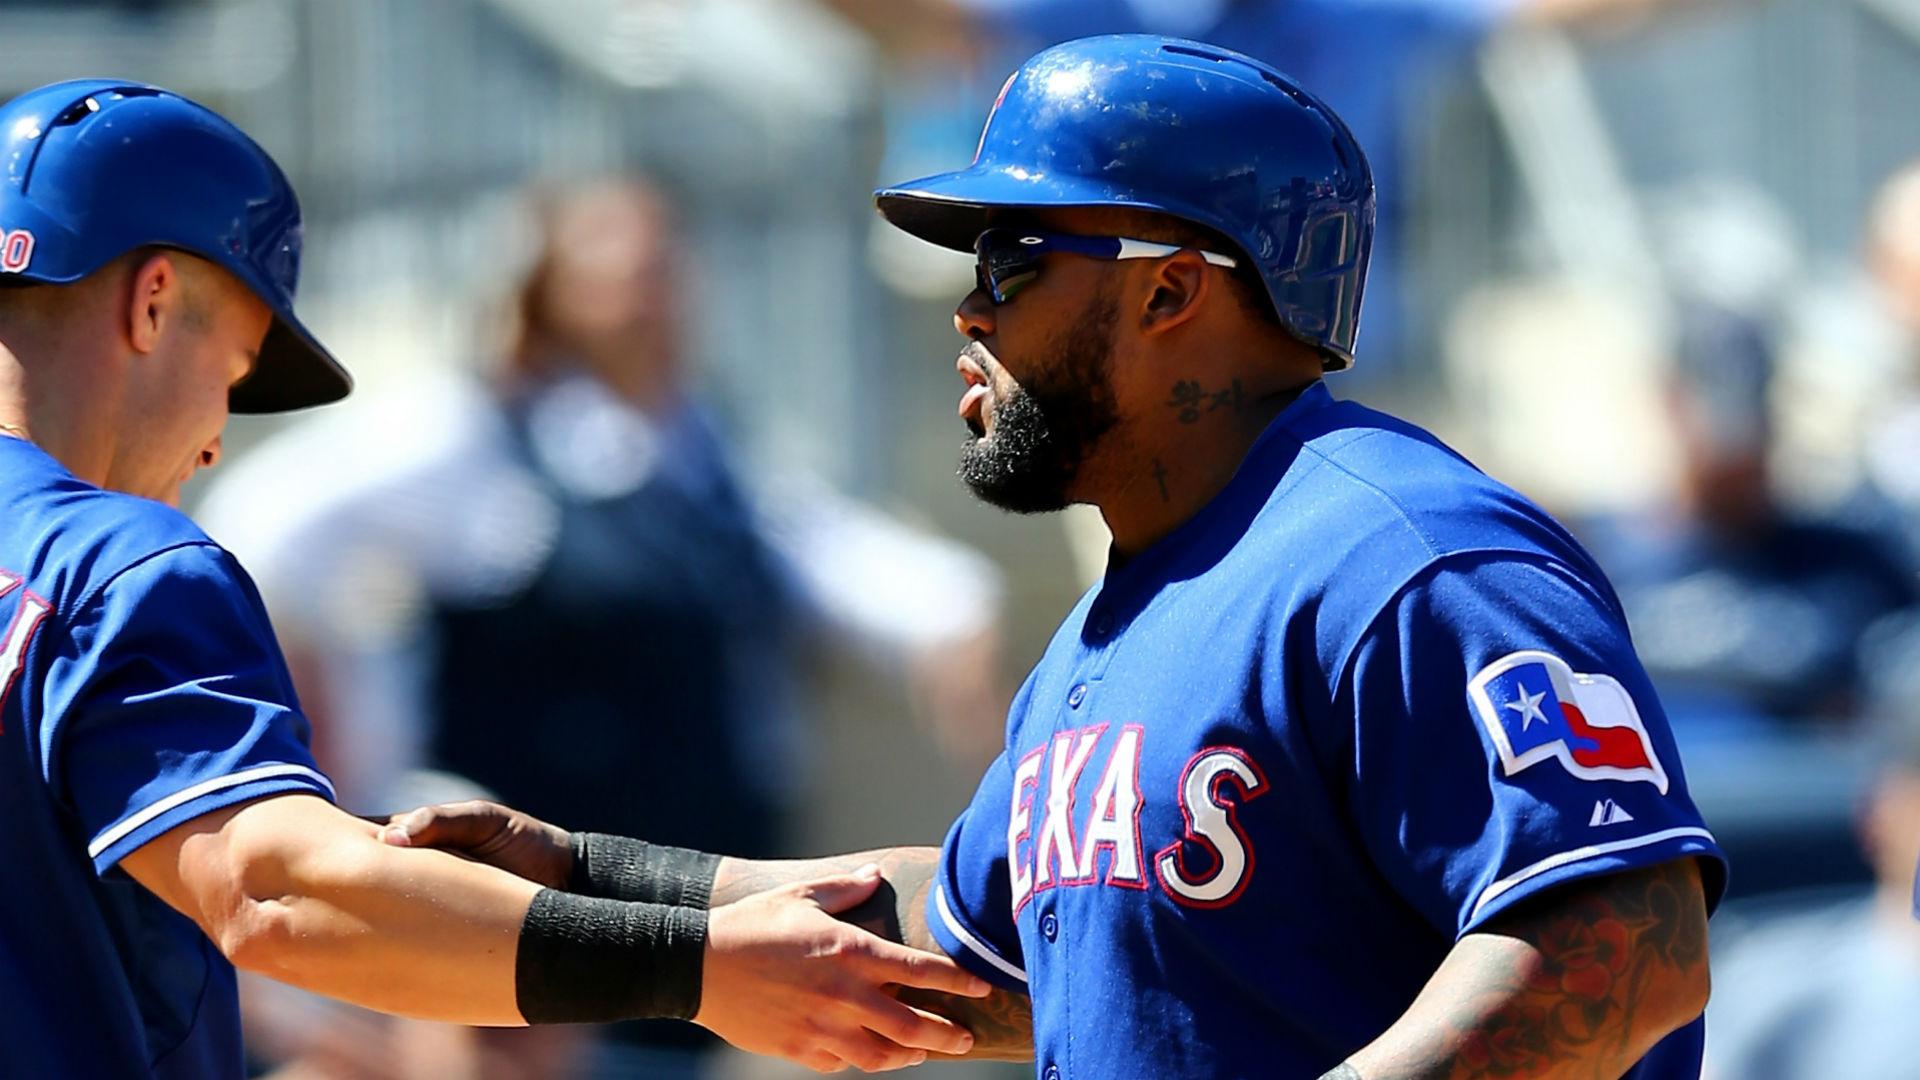 Prince Fielder Rangers Uniform MLB Nightly 9 Prince Fielder